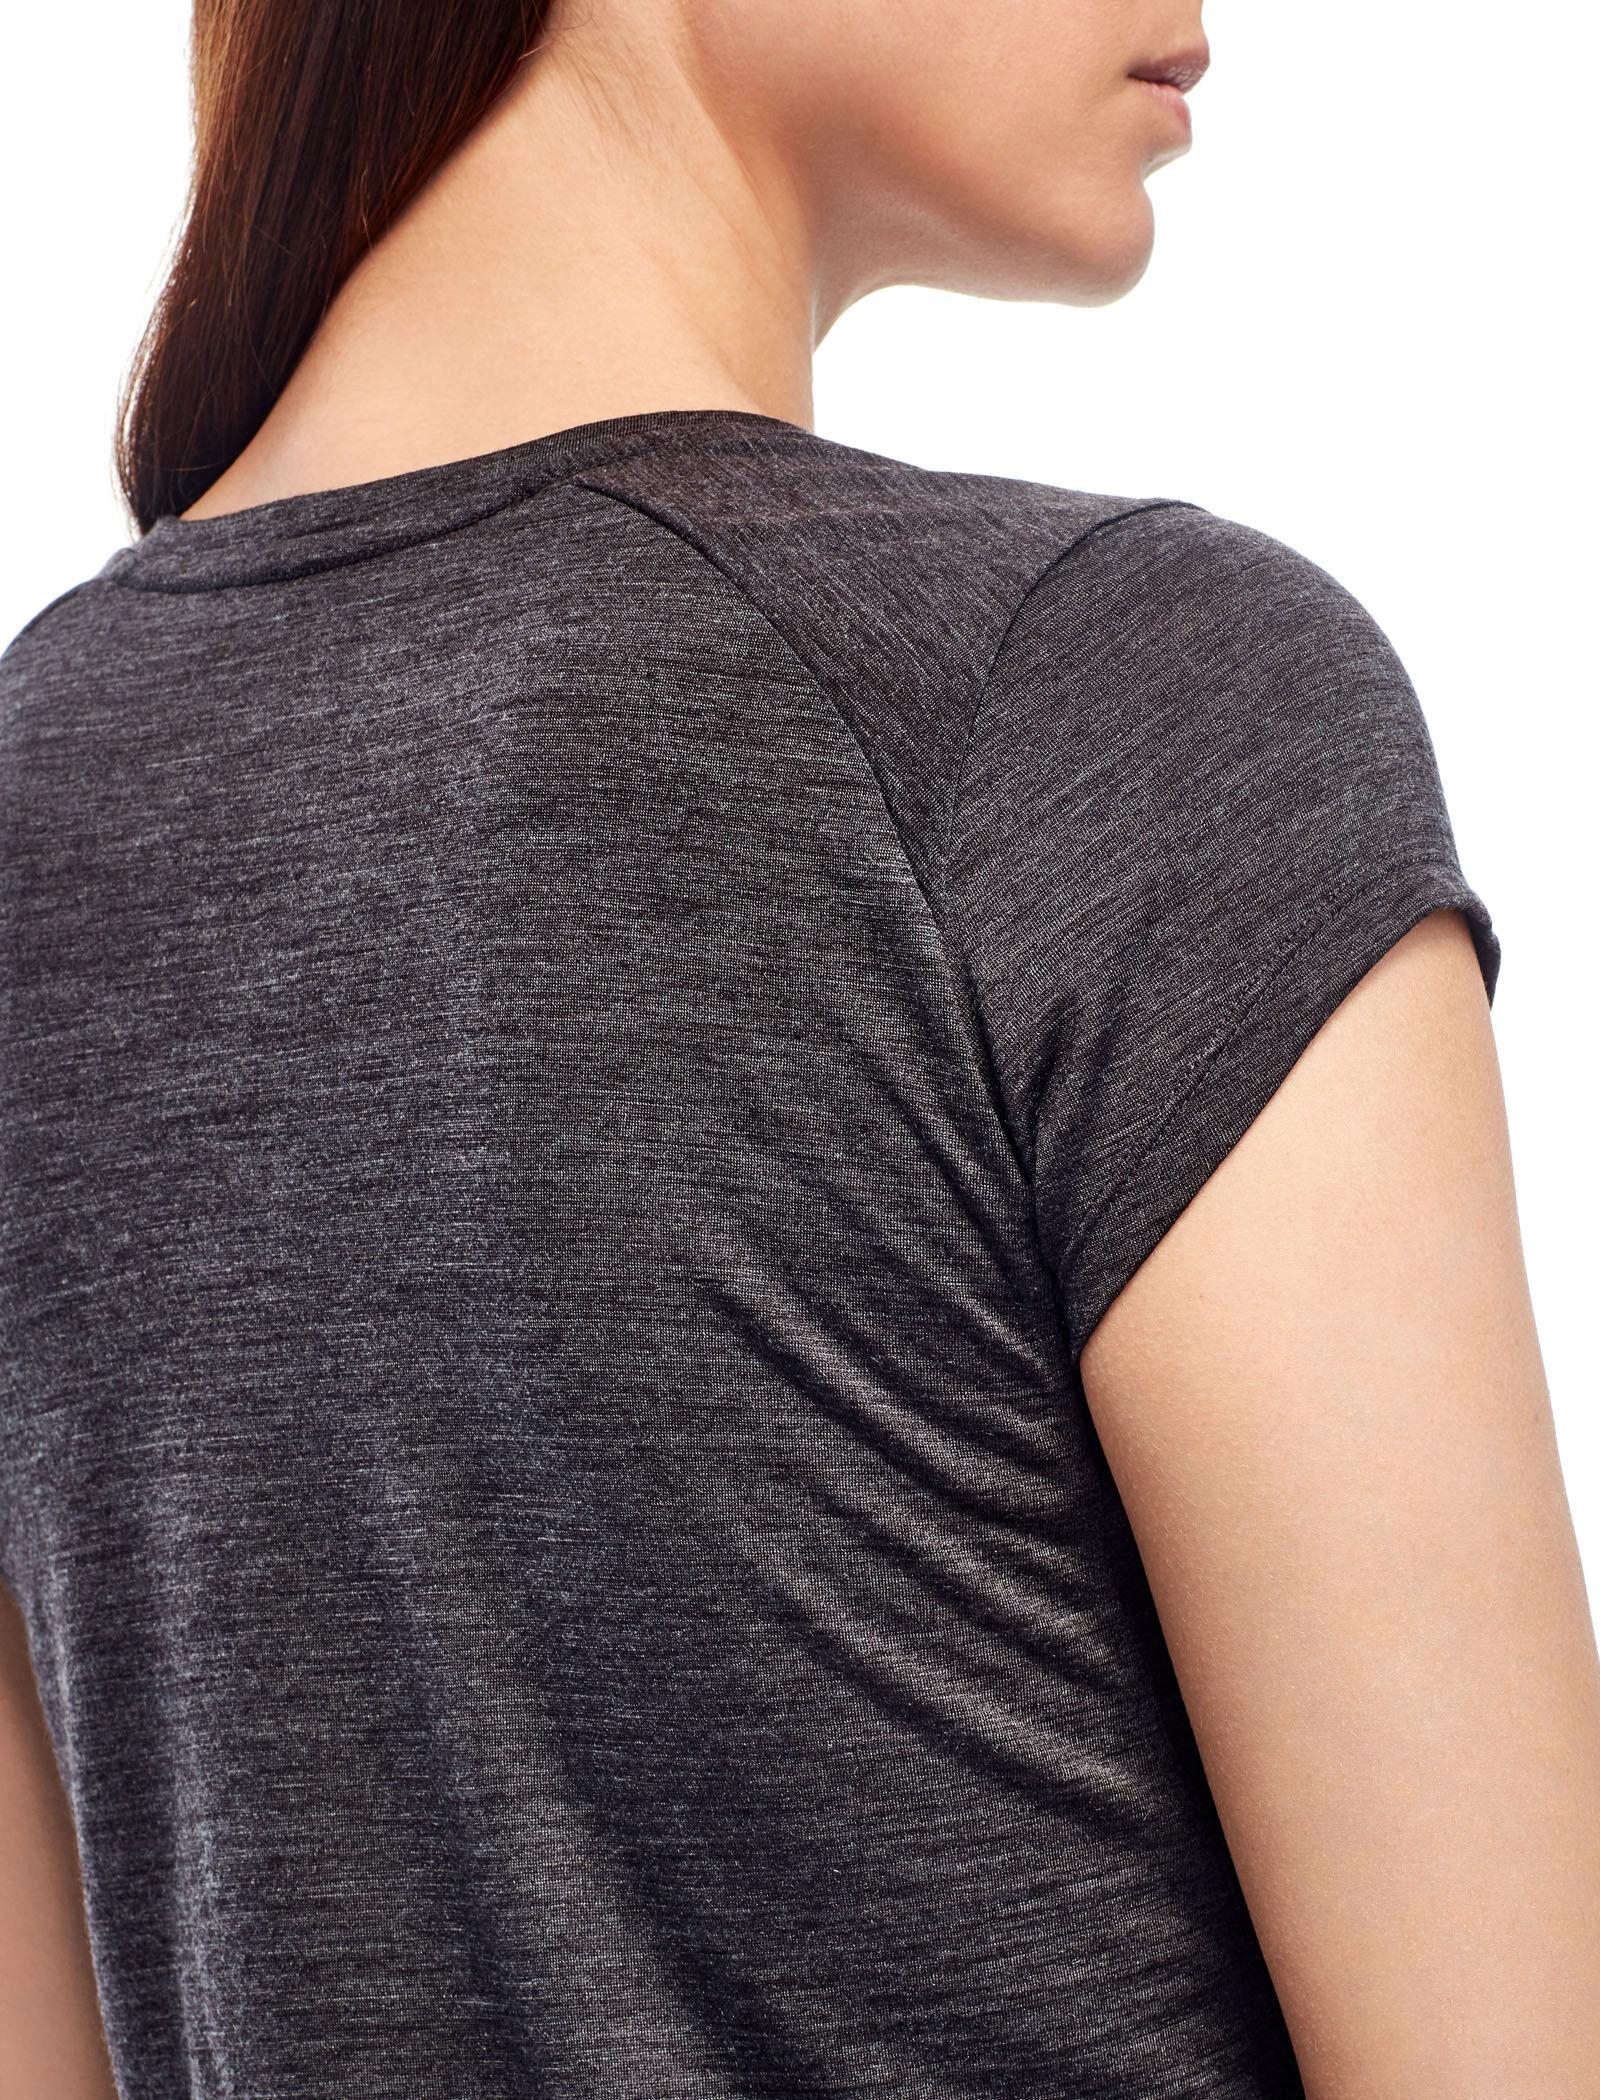 Merino Wool Icebreaker Merino Womens Sphere Lightweight Short Sleeve Scoop Neck Shirt